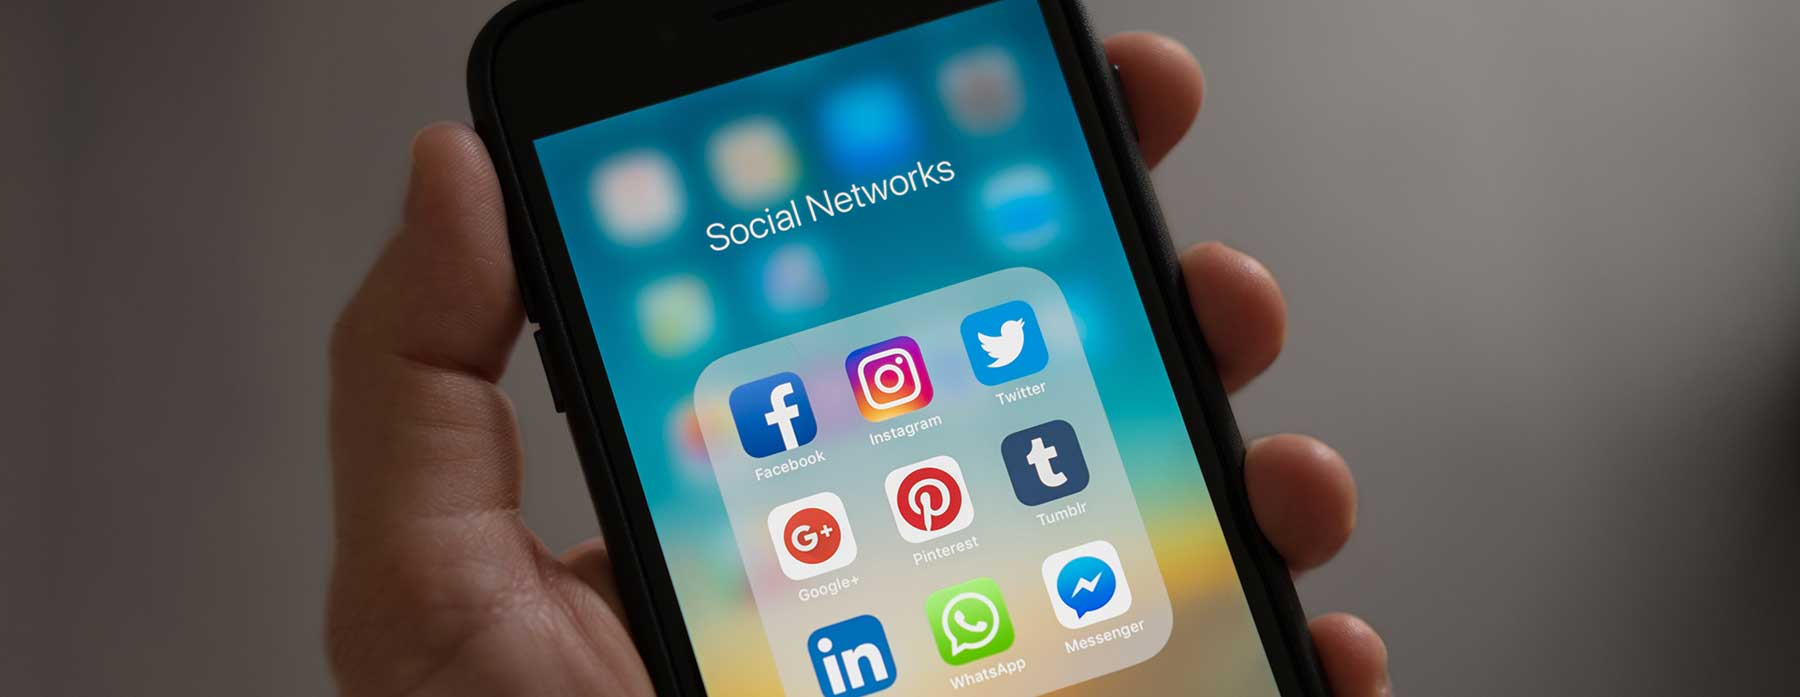 Online Jobs for Teens - Social Media manager